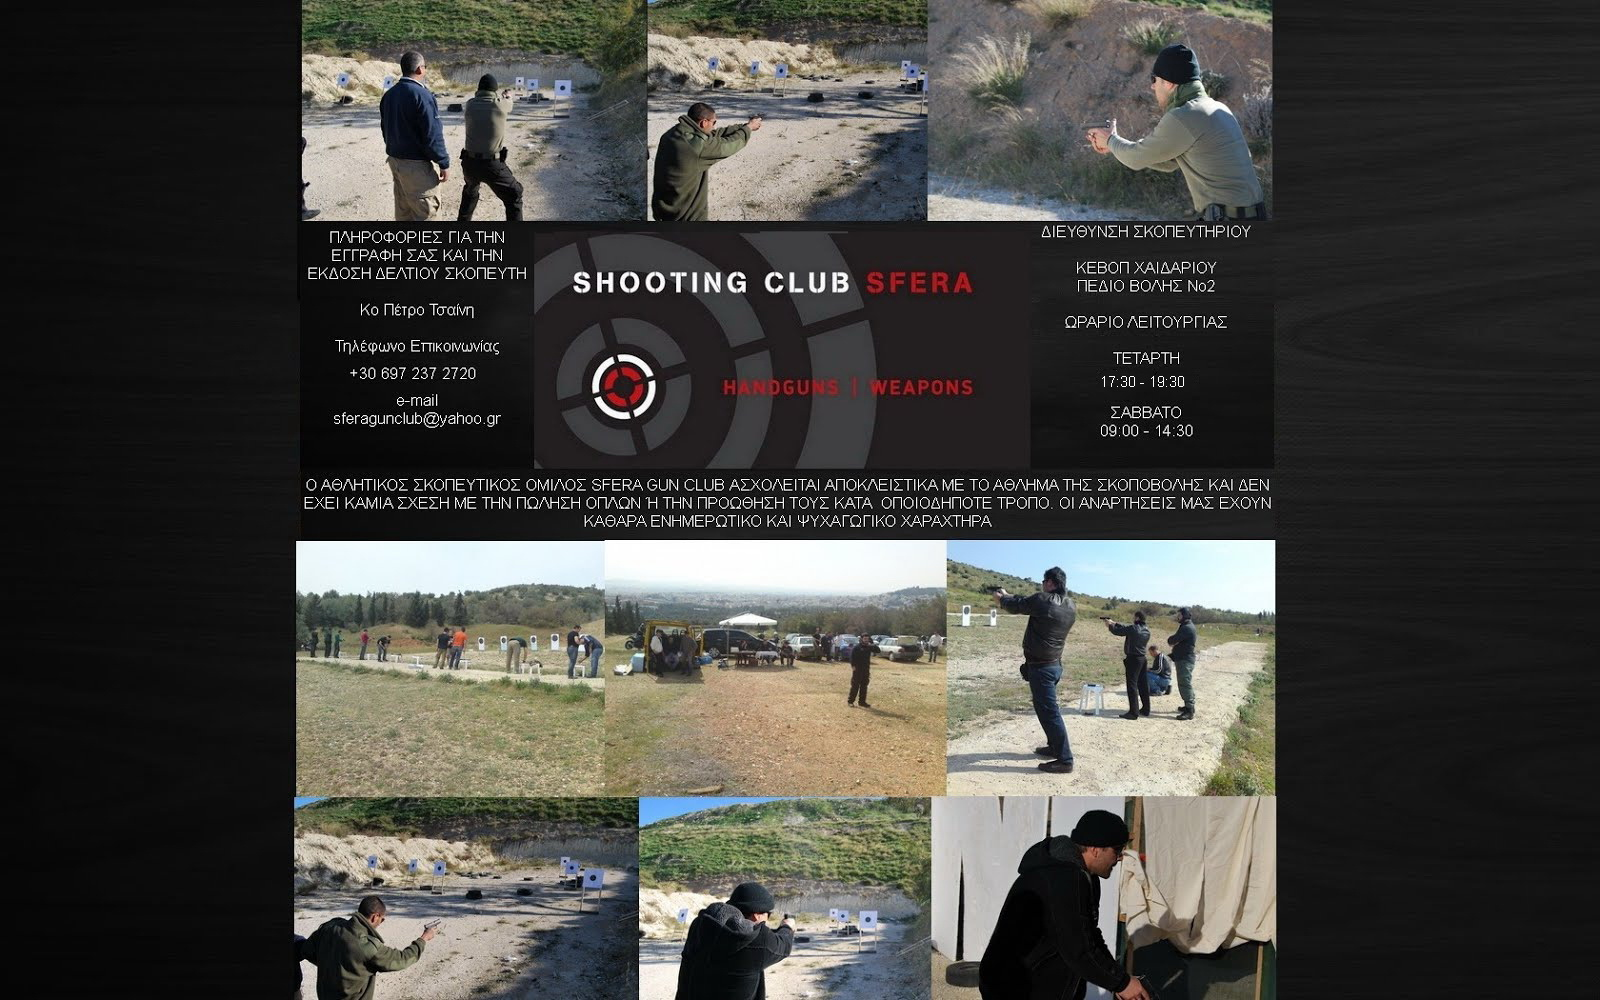 Sfera Gun Club